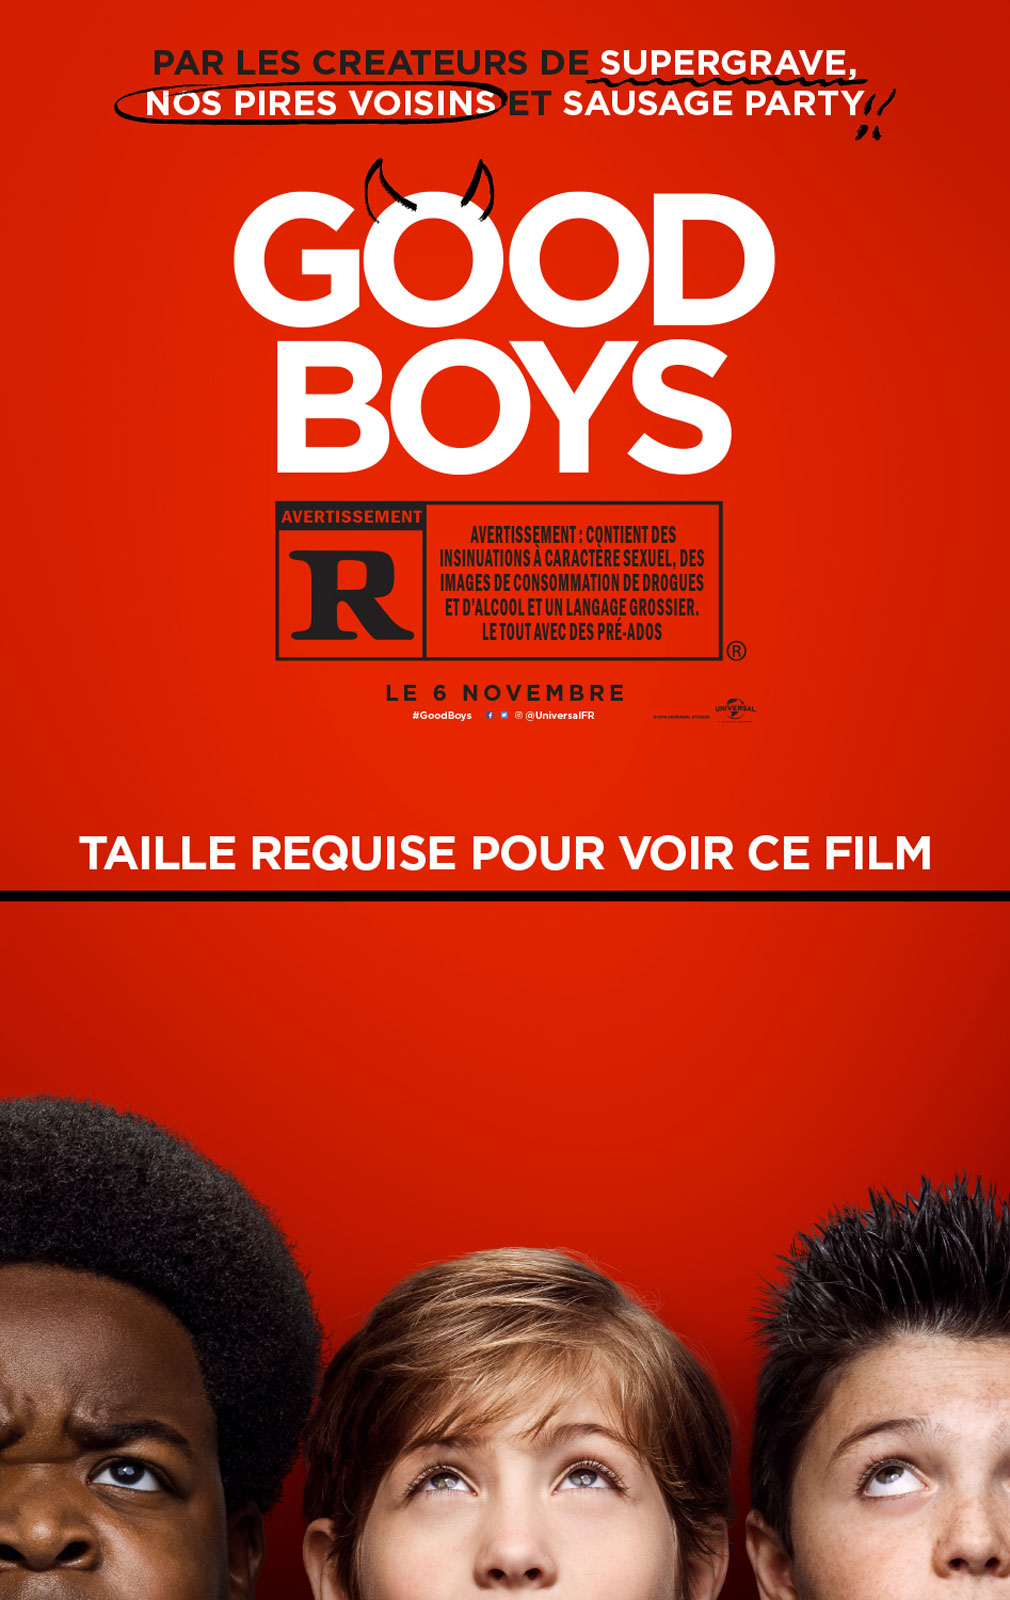 http://rss.allocine.fr/~r/ac/cine/cettesemaine/~3/cz0R8PxSQKI/fichefilm_gen_cfilm=258241.html